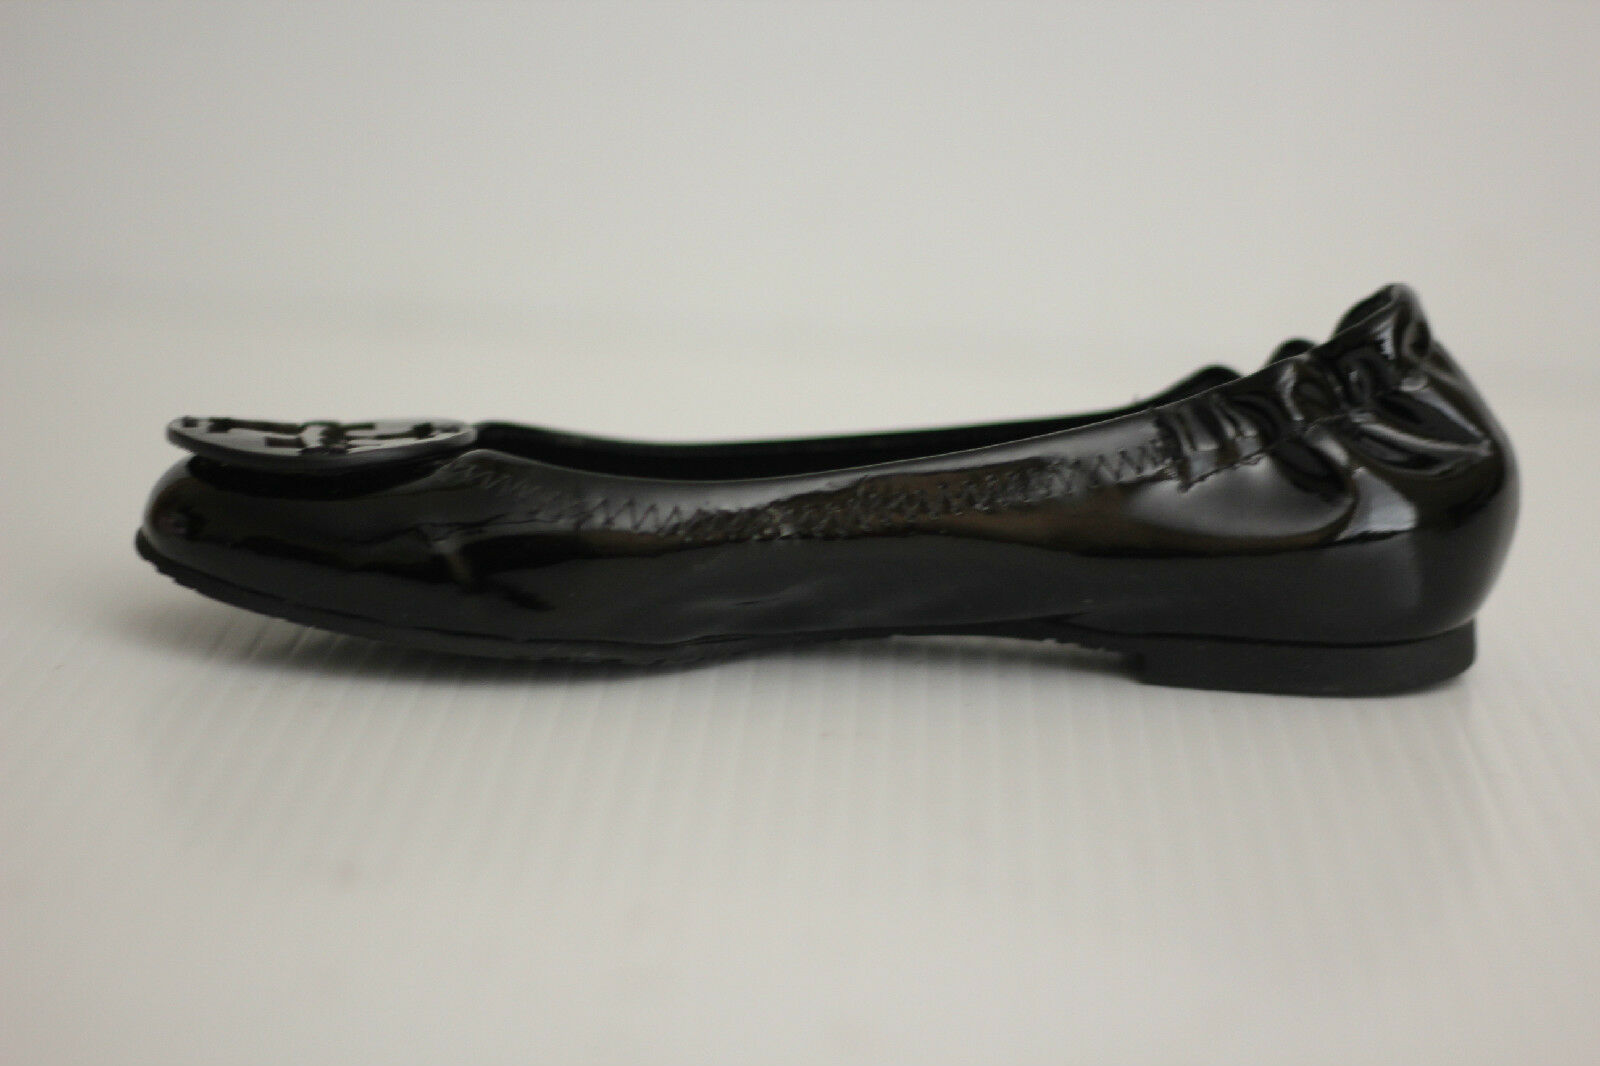 TORY TORY TORY BURCH Reva Ballerina Ballet Flats - Black Patent Leather - Size 4 M (X53) 93a2d4